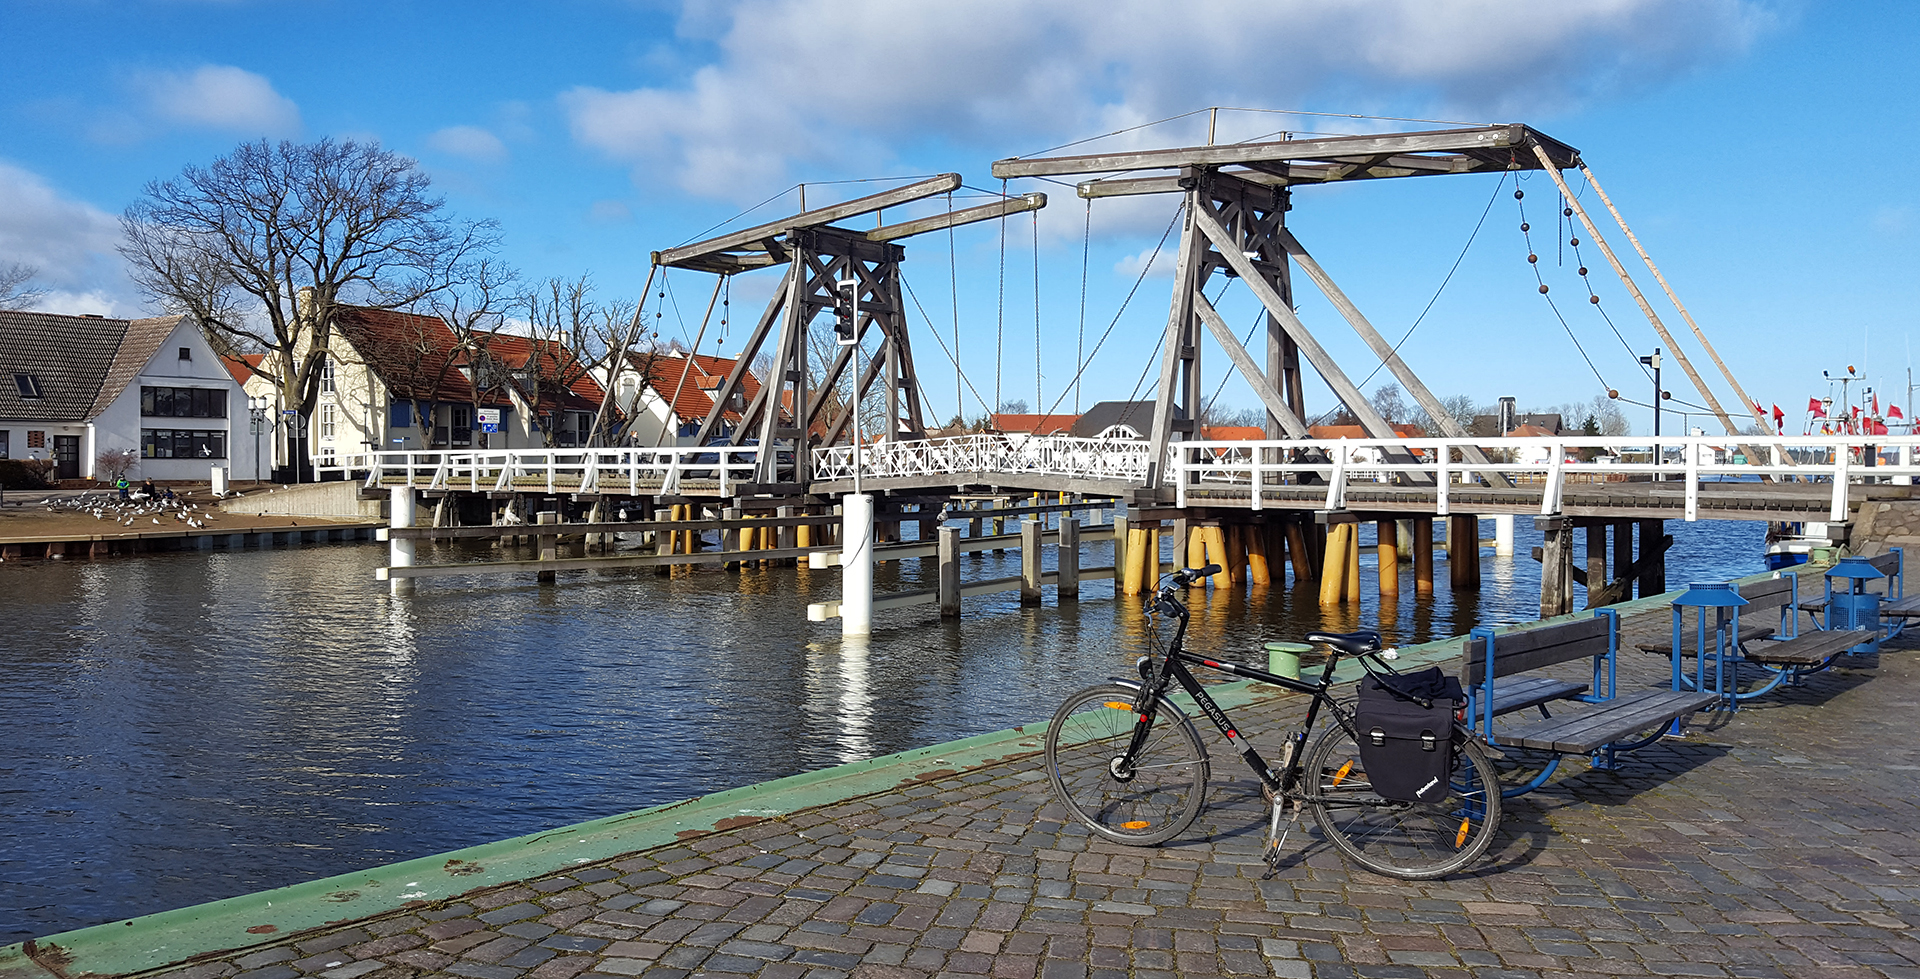 Frühlingsanfang - Nachmittag in Greifswald-Wieck